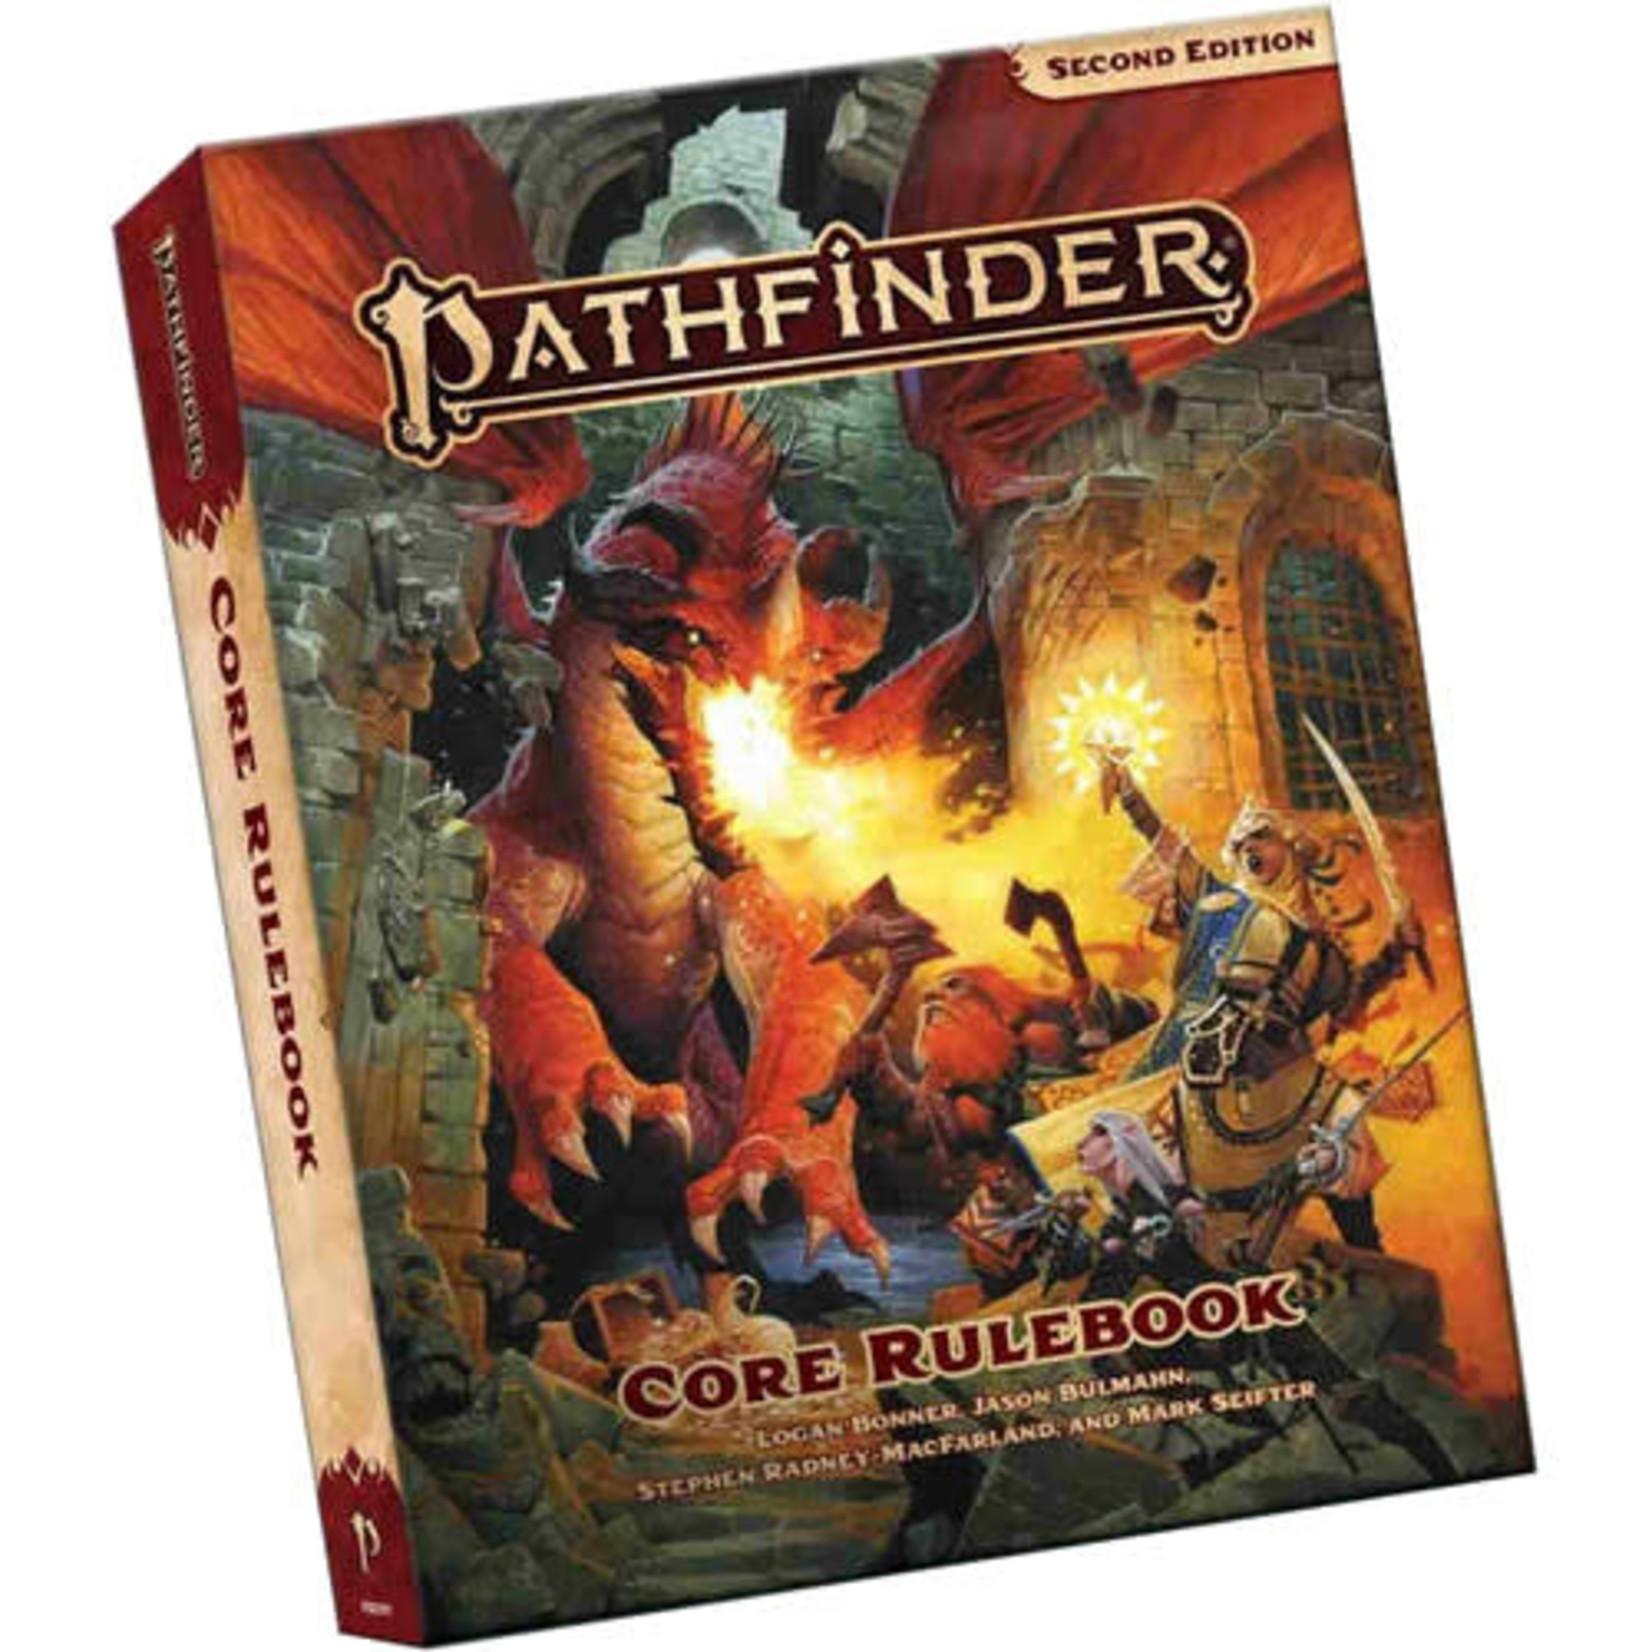 Pathfinder RPG: Core Rulebook 2e (pocket edition)